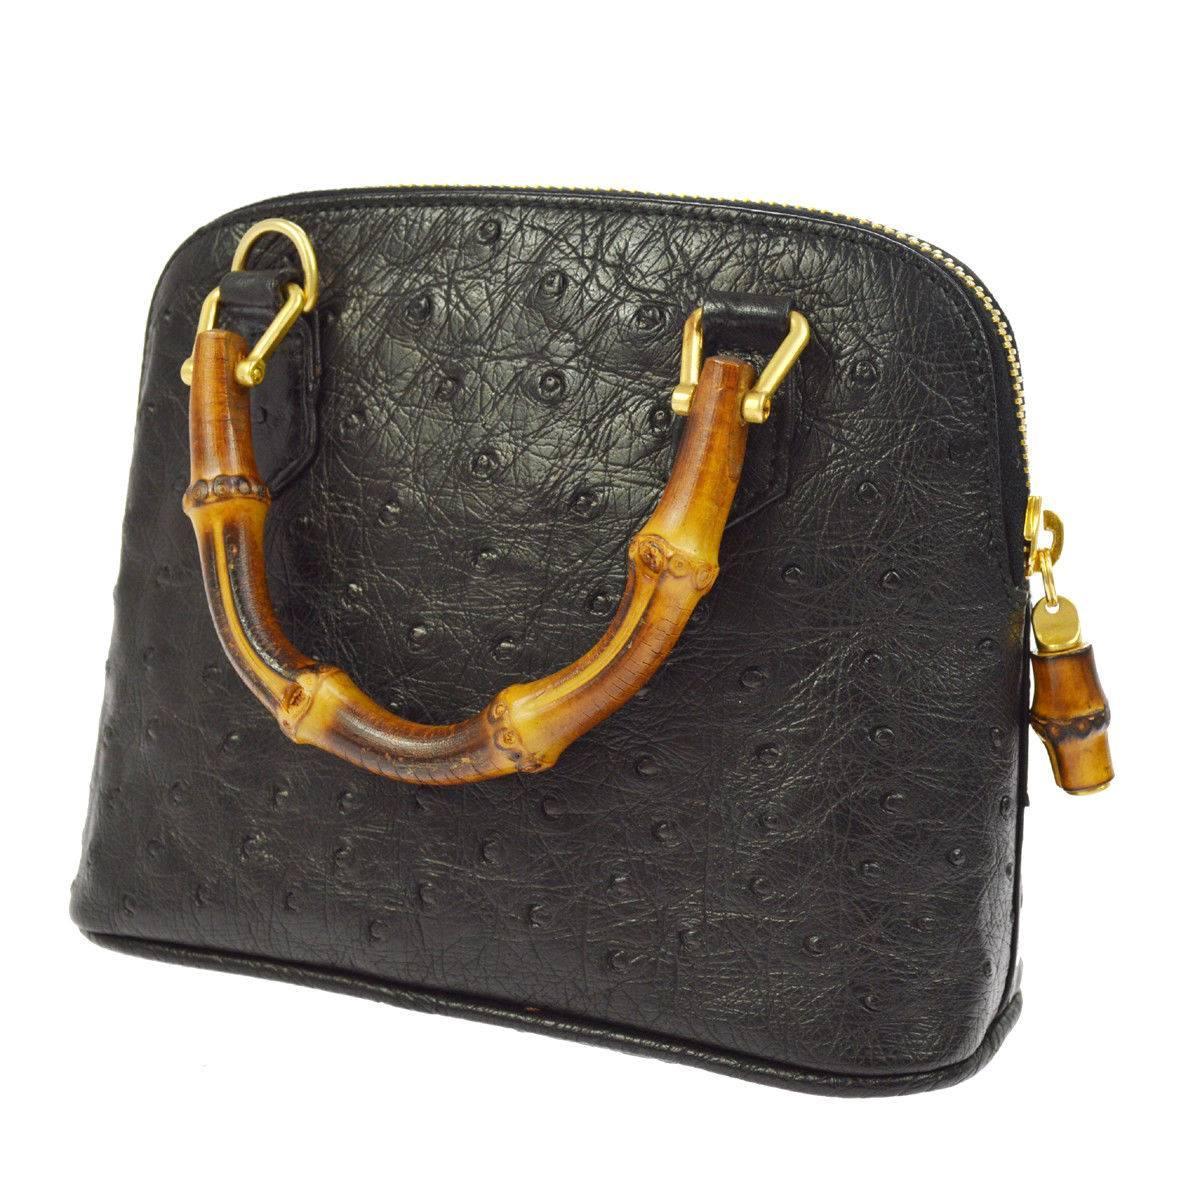 Gucci Black Ostrich Leather Bamboo Gold Mini Top Handle Satchel Shoulder Bag m0Eukp2f